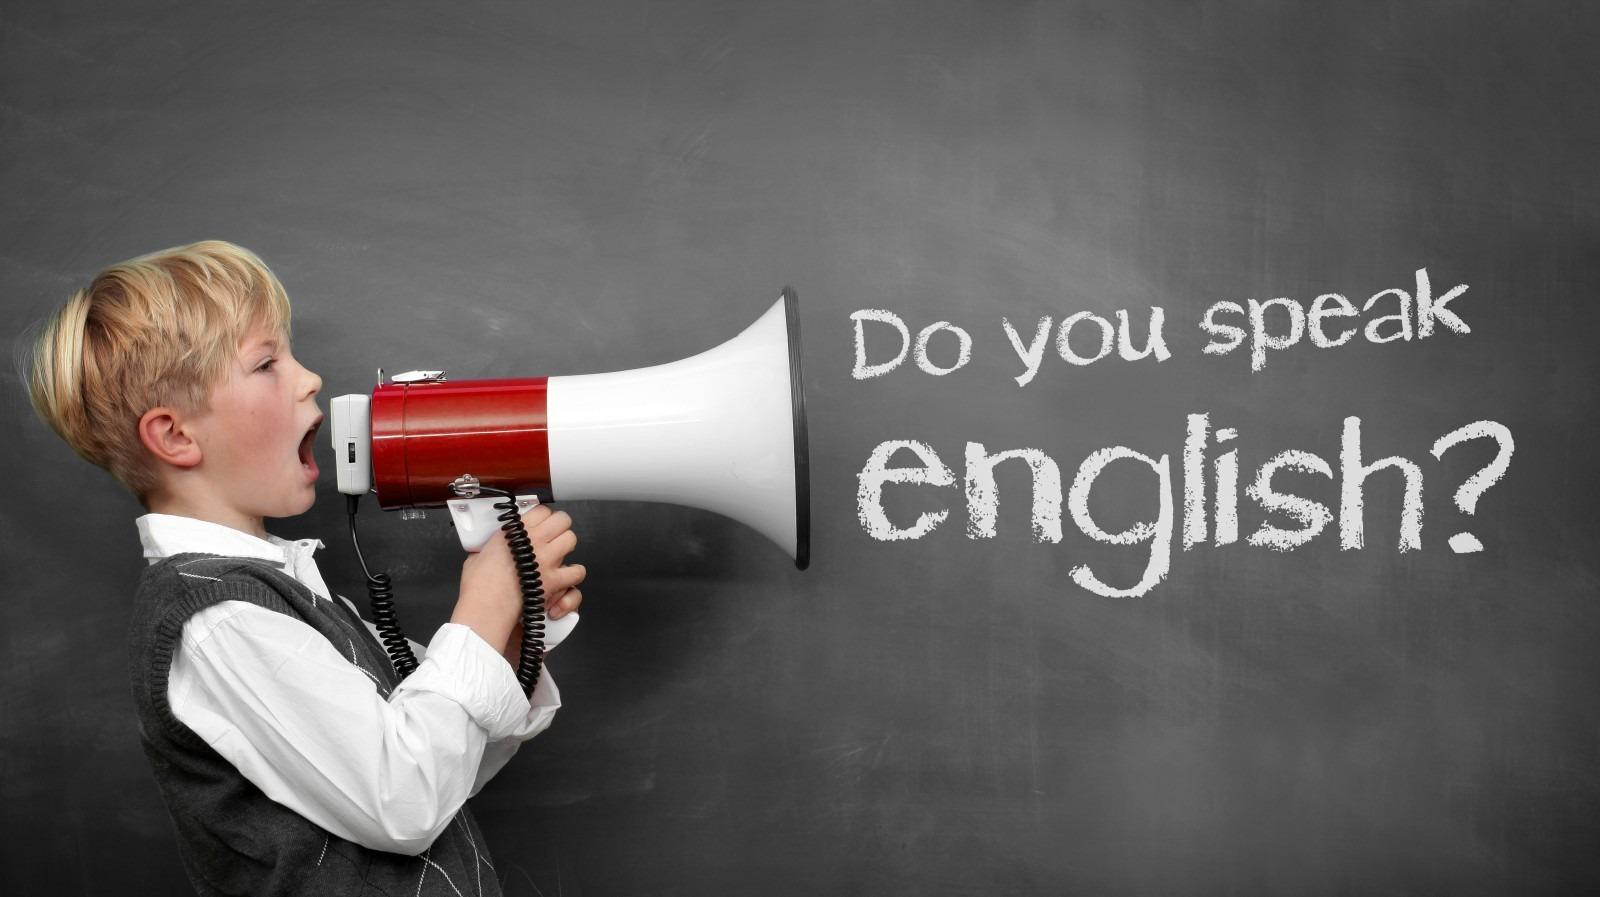 Boy-Say-Do-you-speak-English